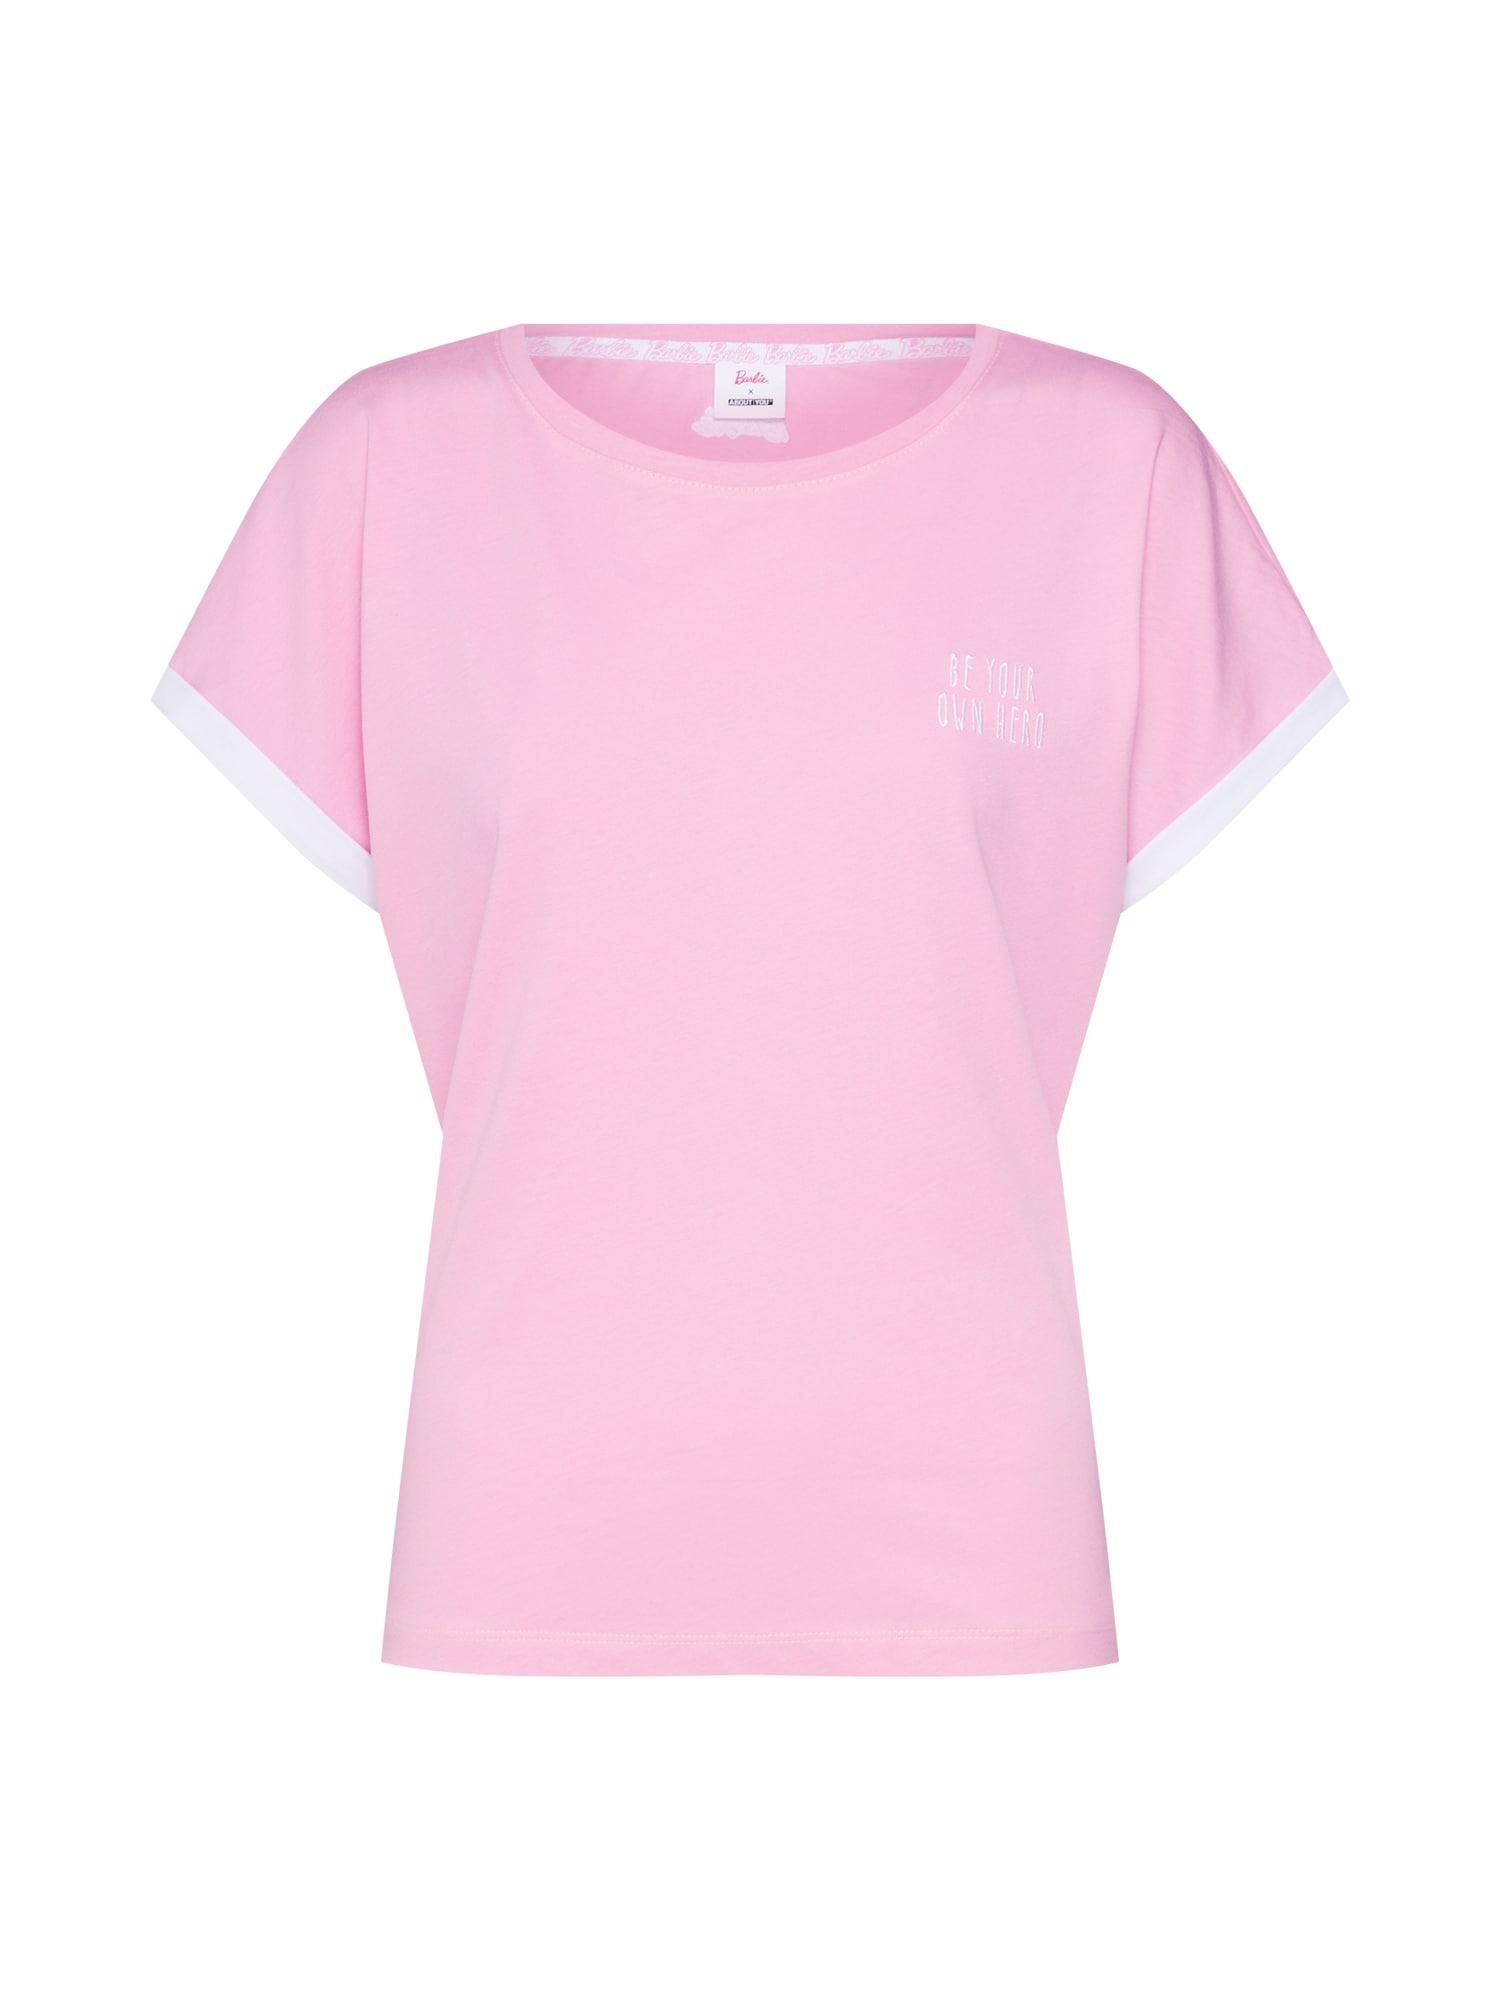 Tričko Fabienne pink ABOUT YOU X Barbie